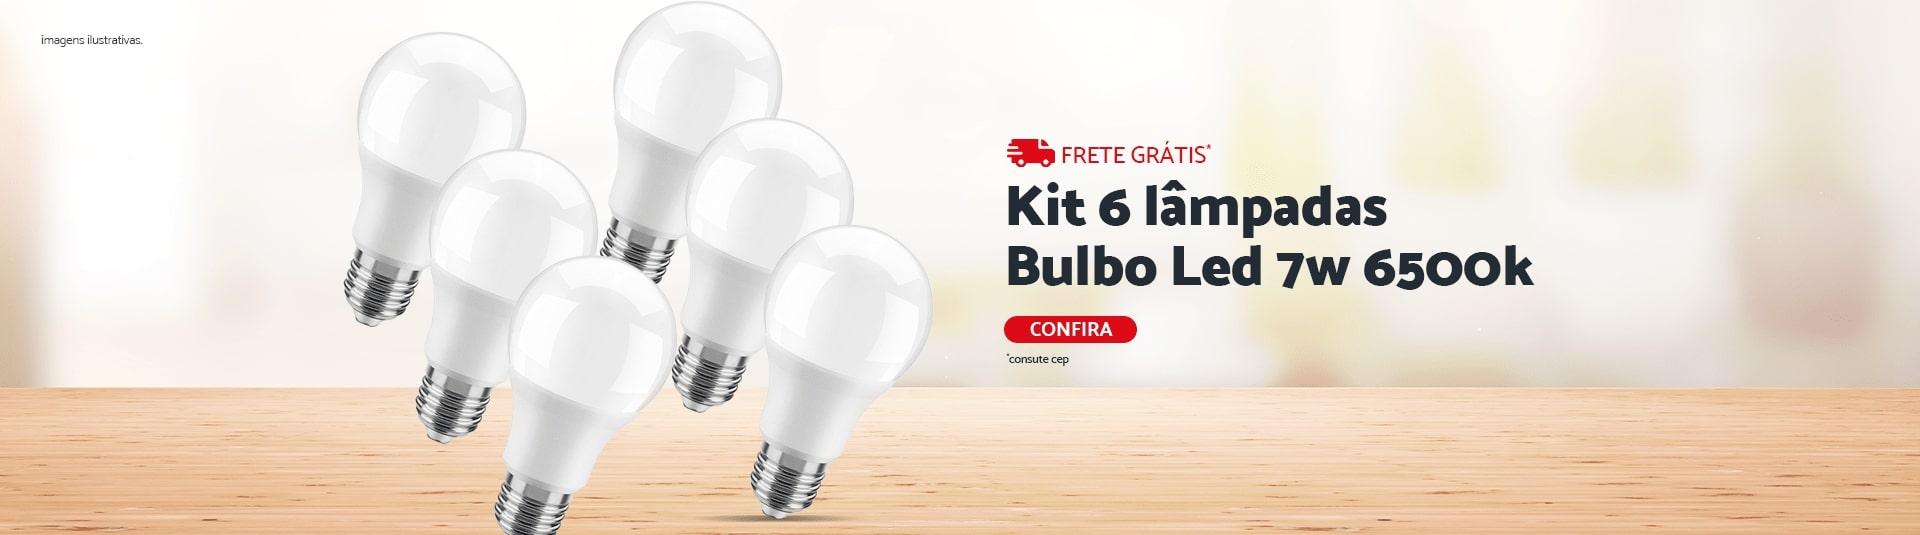 Kit 6 Lampadas Bulbo 7W